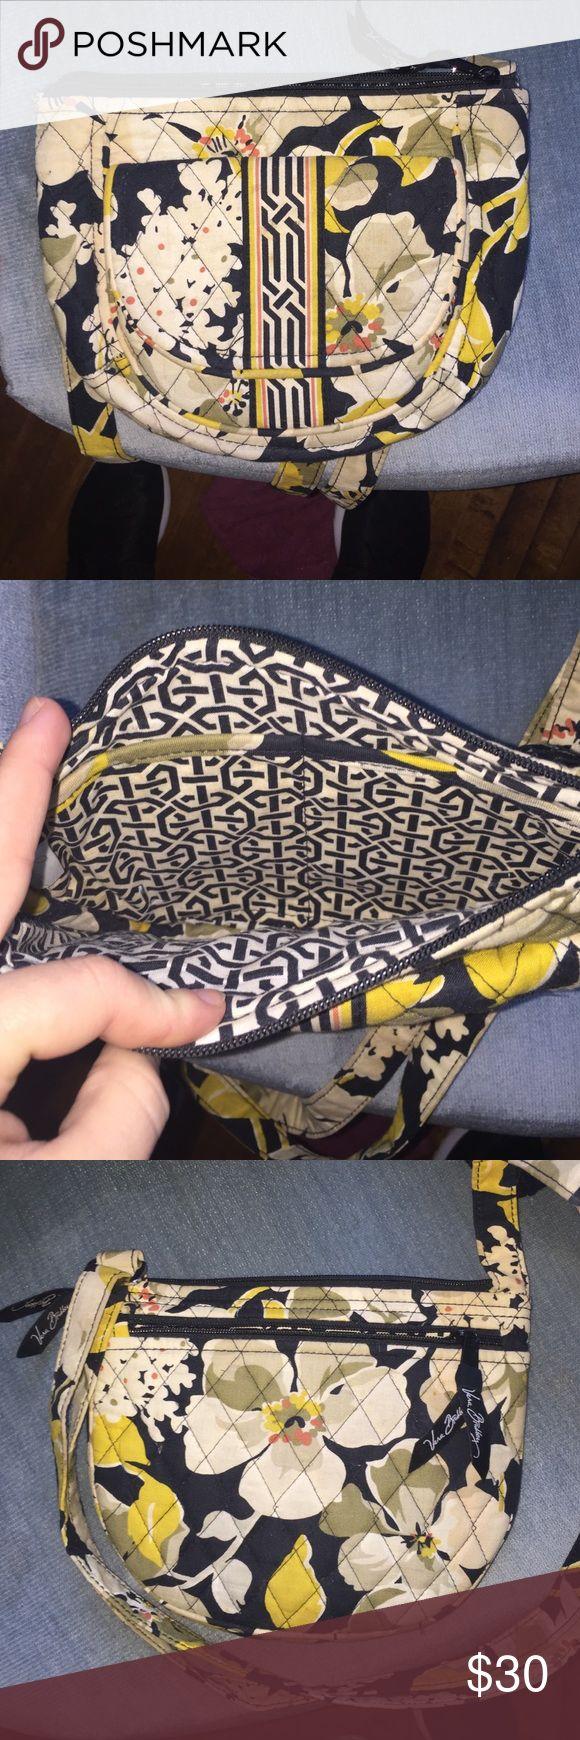 Vera Bradley side purse Multi colored side purse Vera Bradley Bags Crossbody Bags